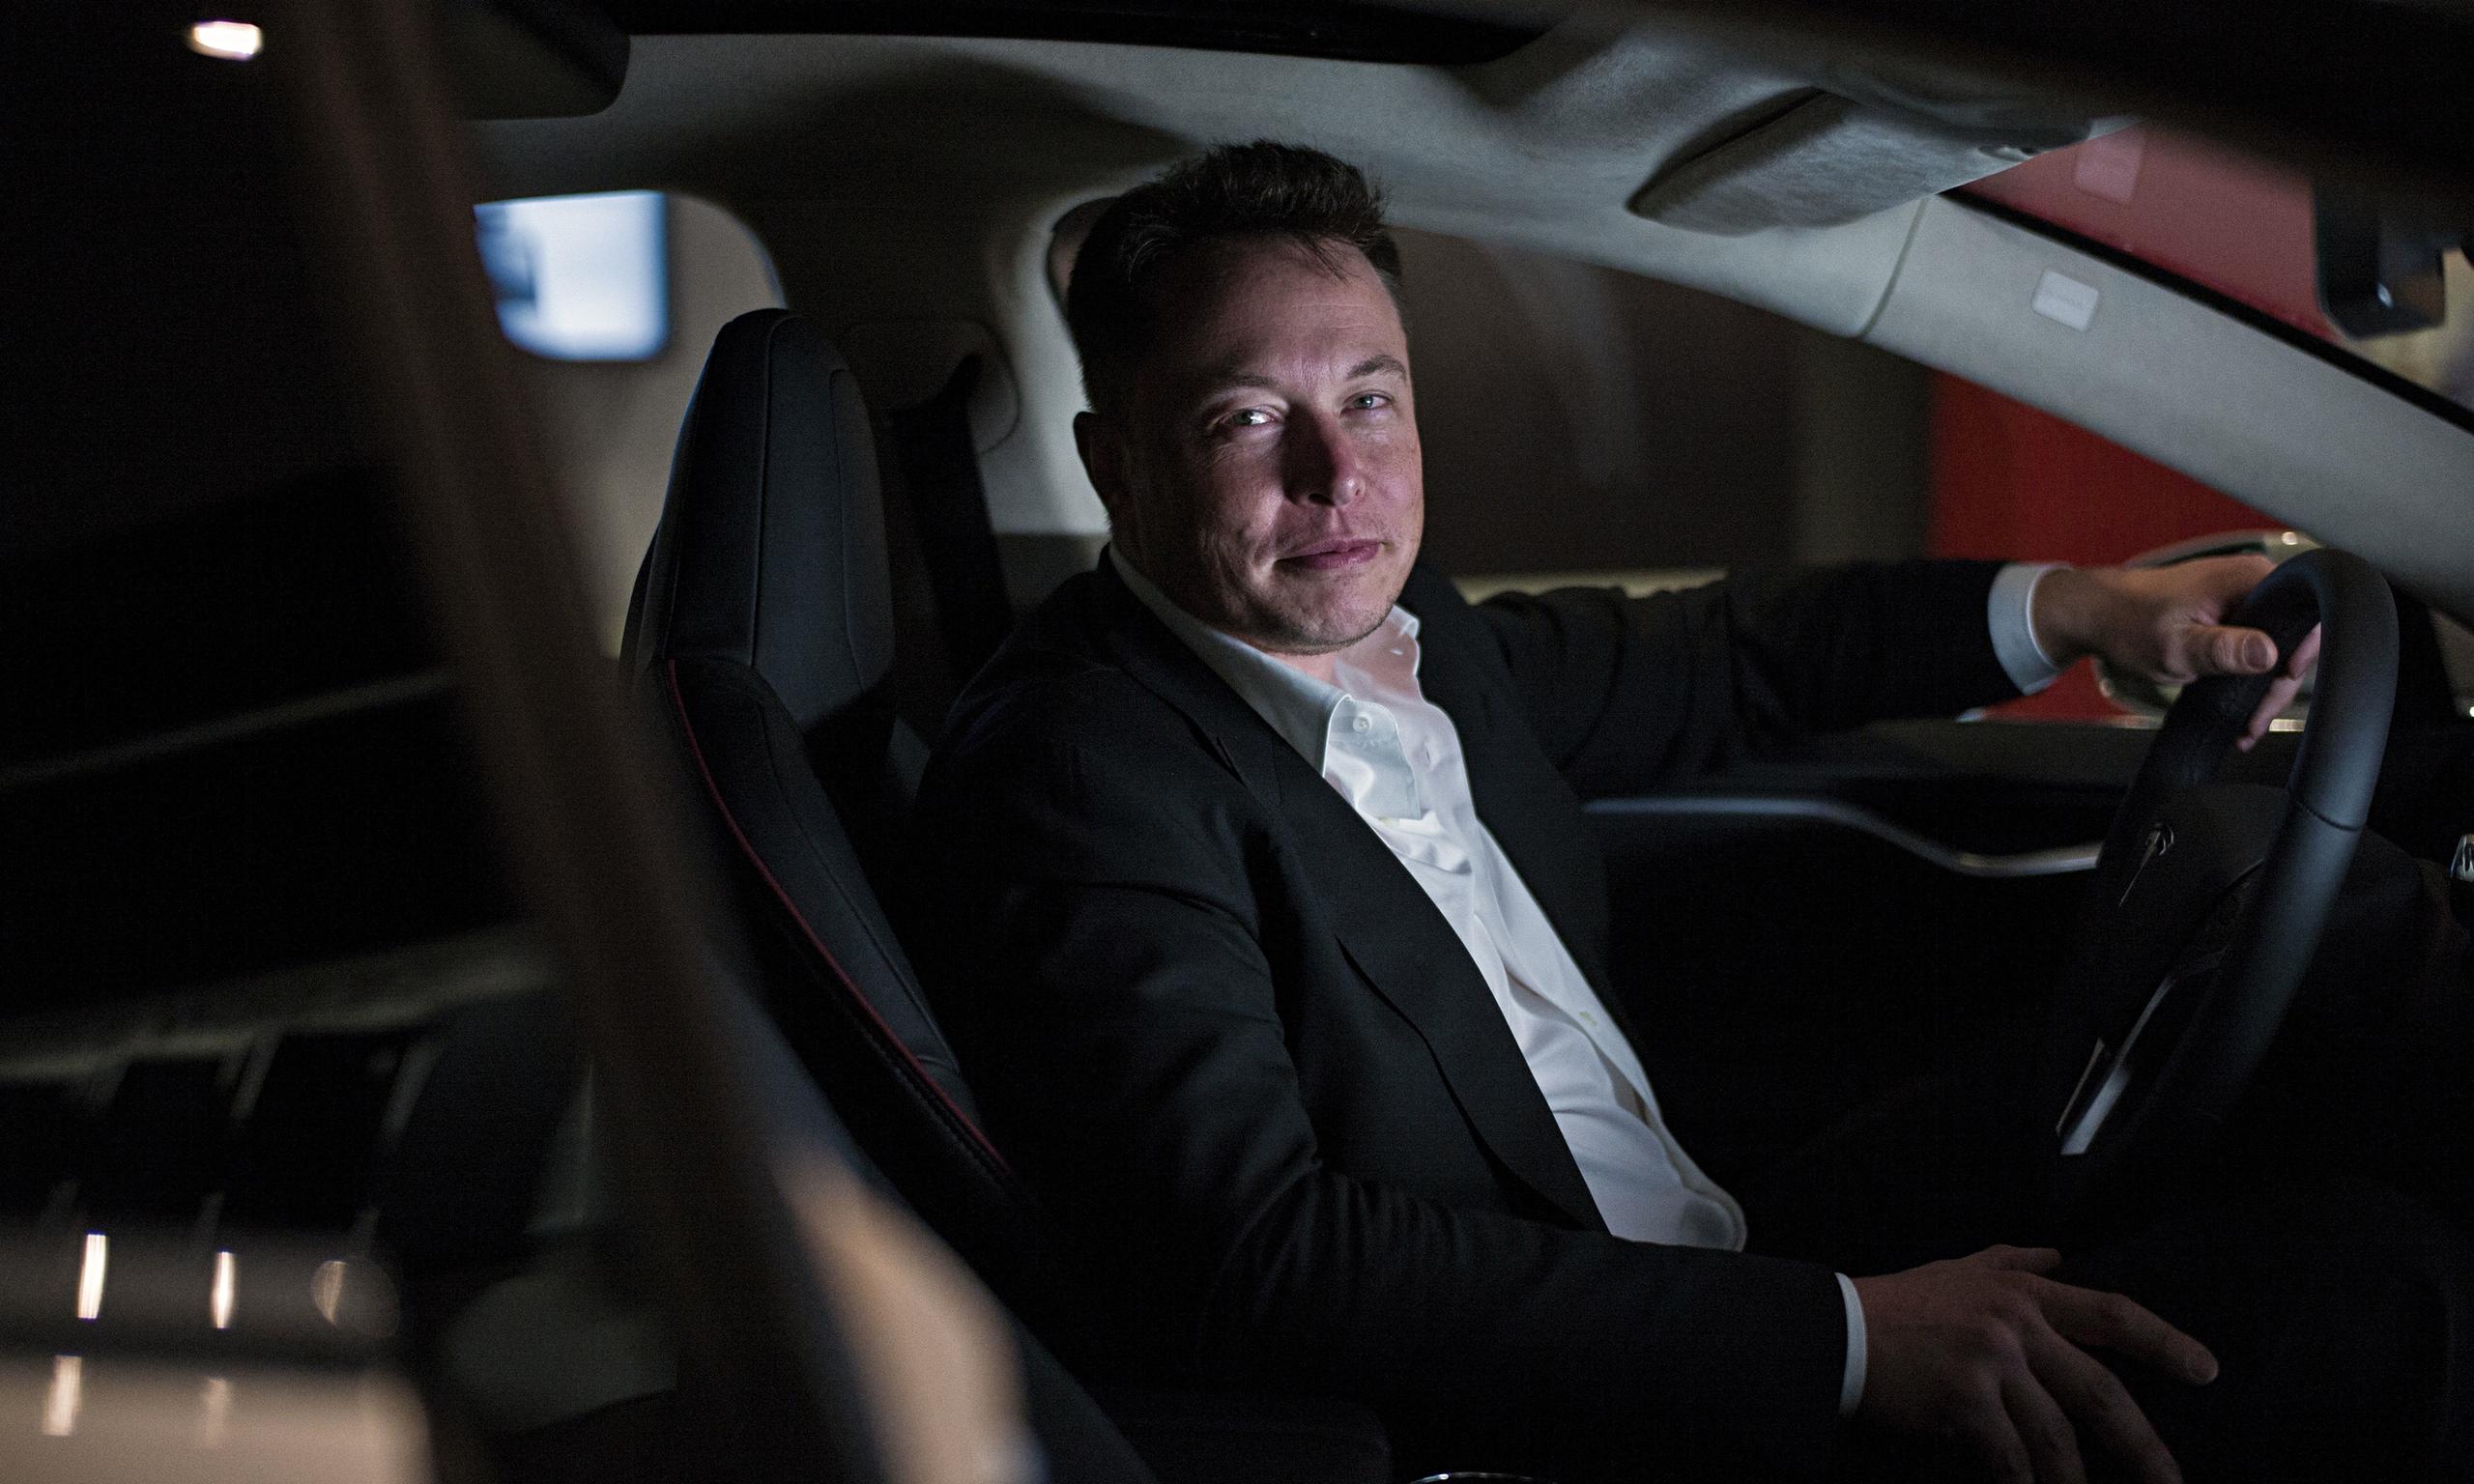 Electric Car Maker Tesla